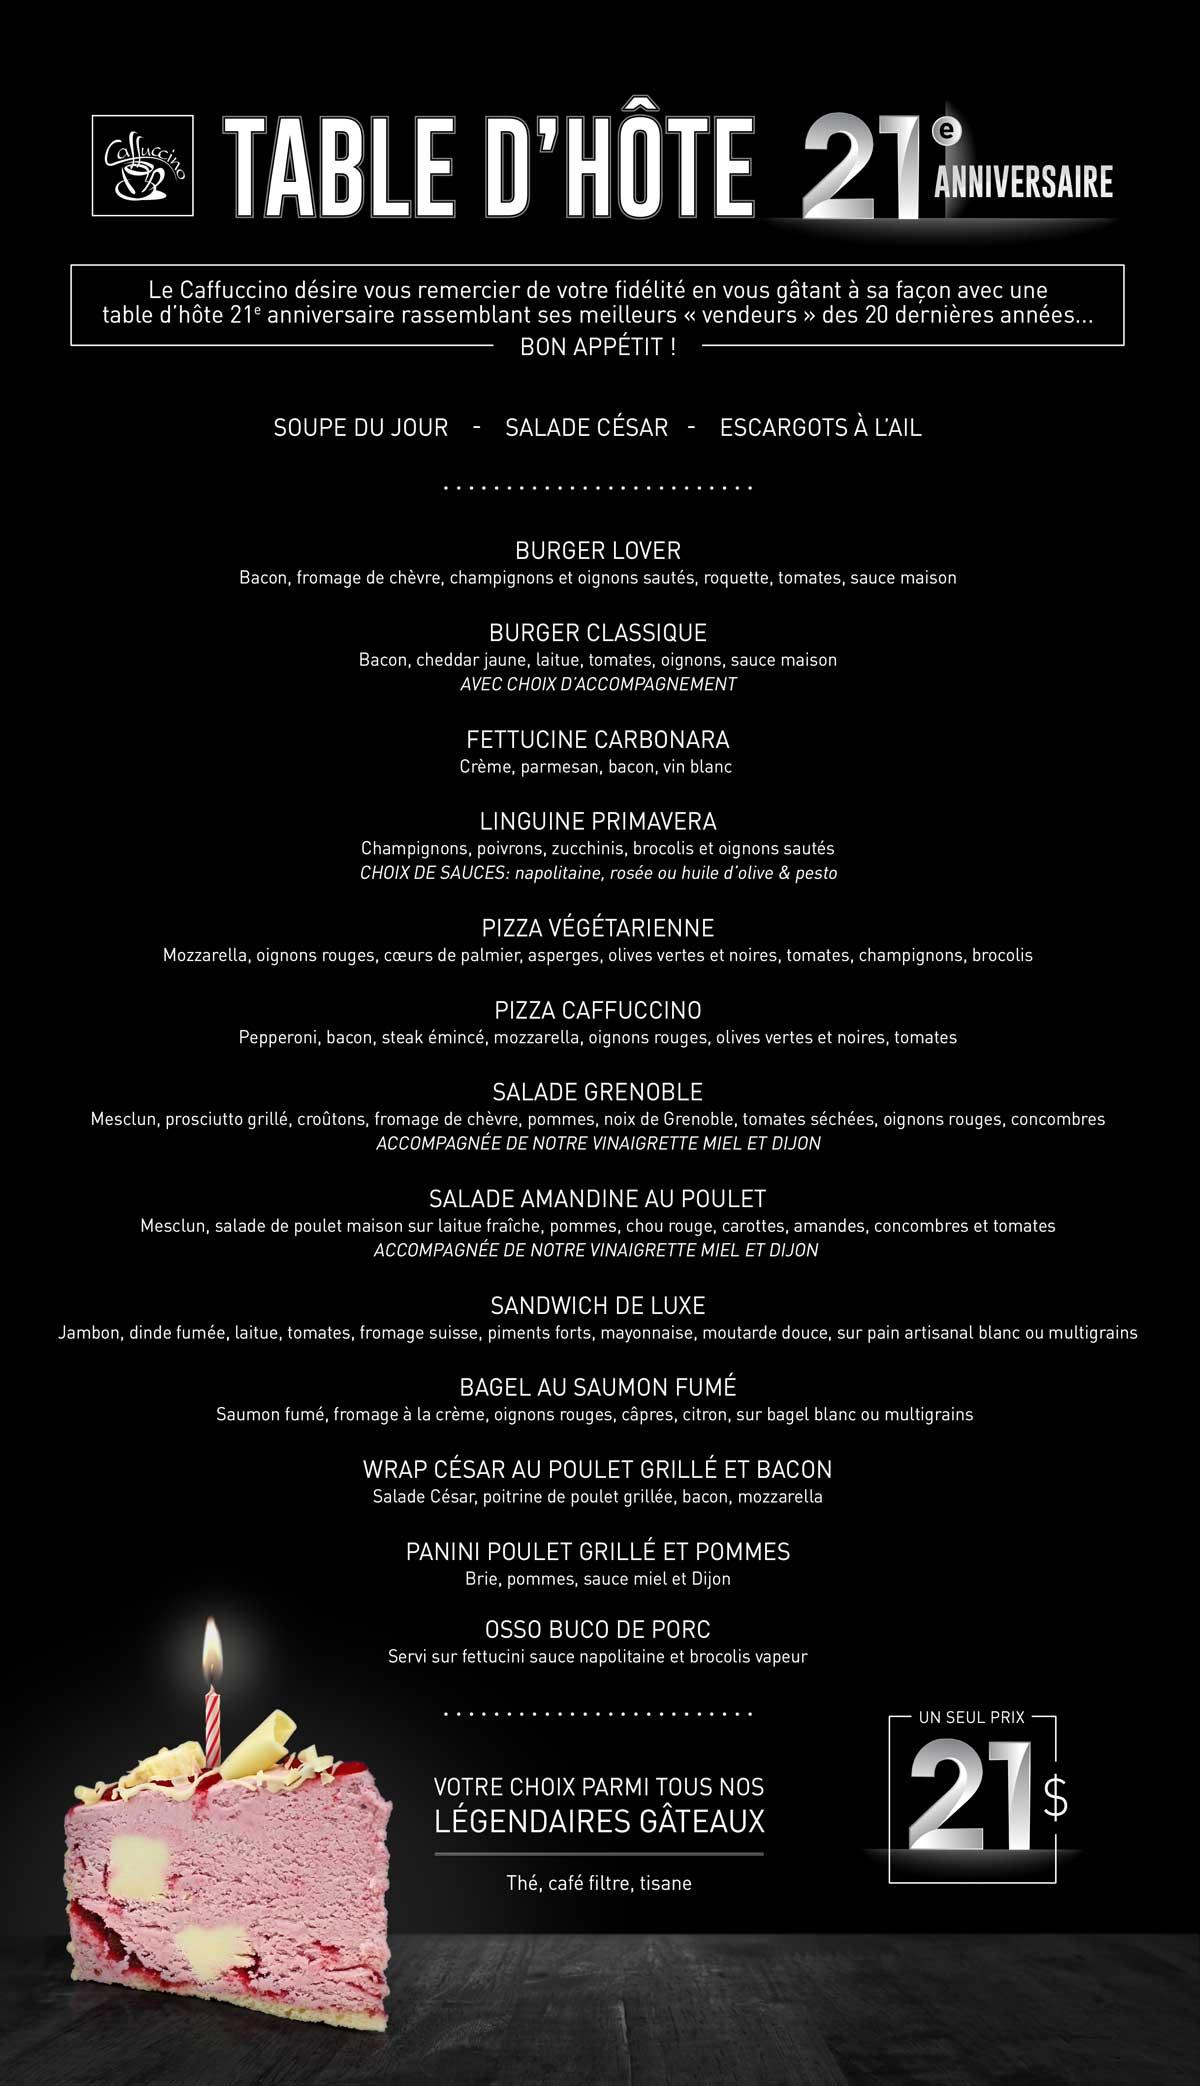 Caffuccino - Table d'hôte 21e anniversaire